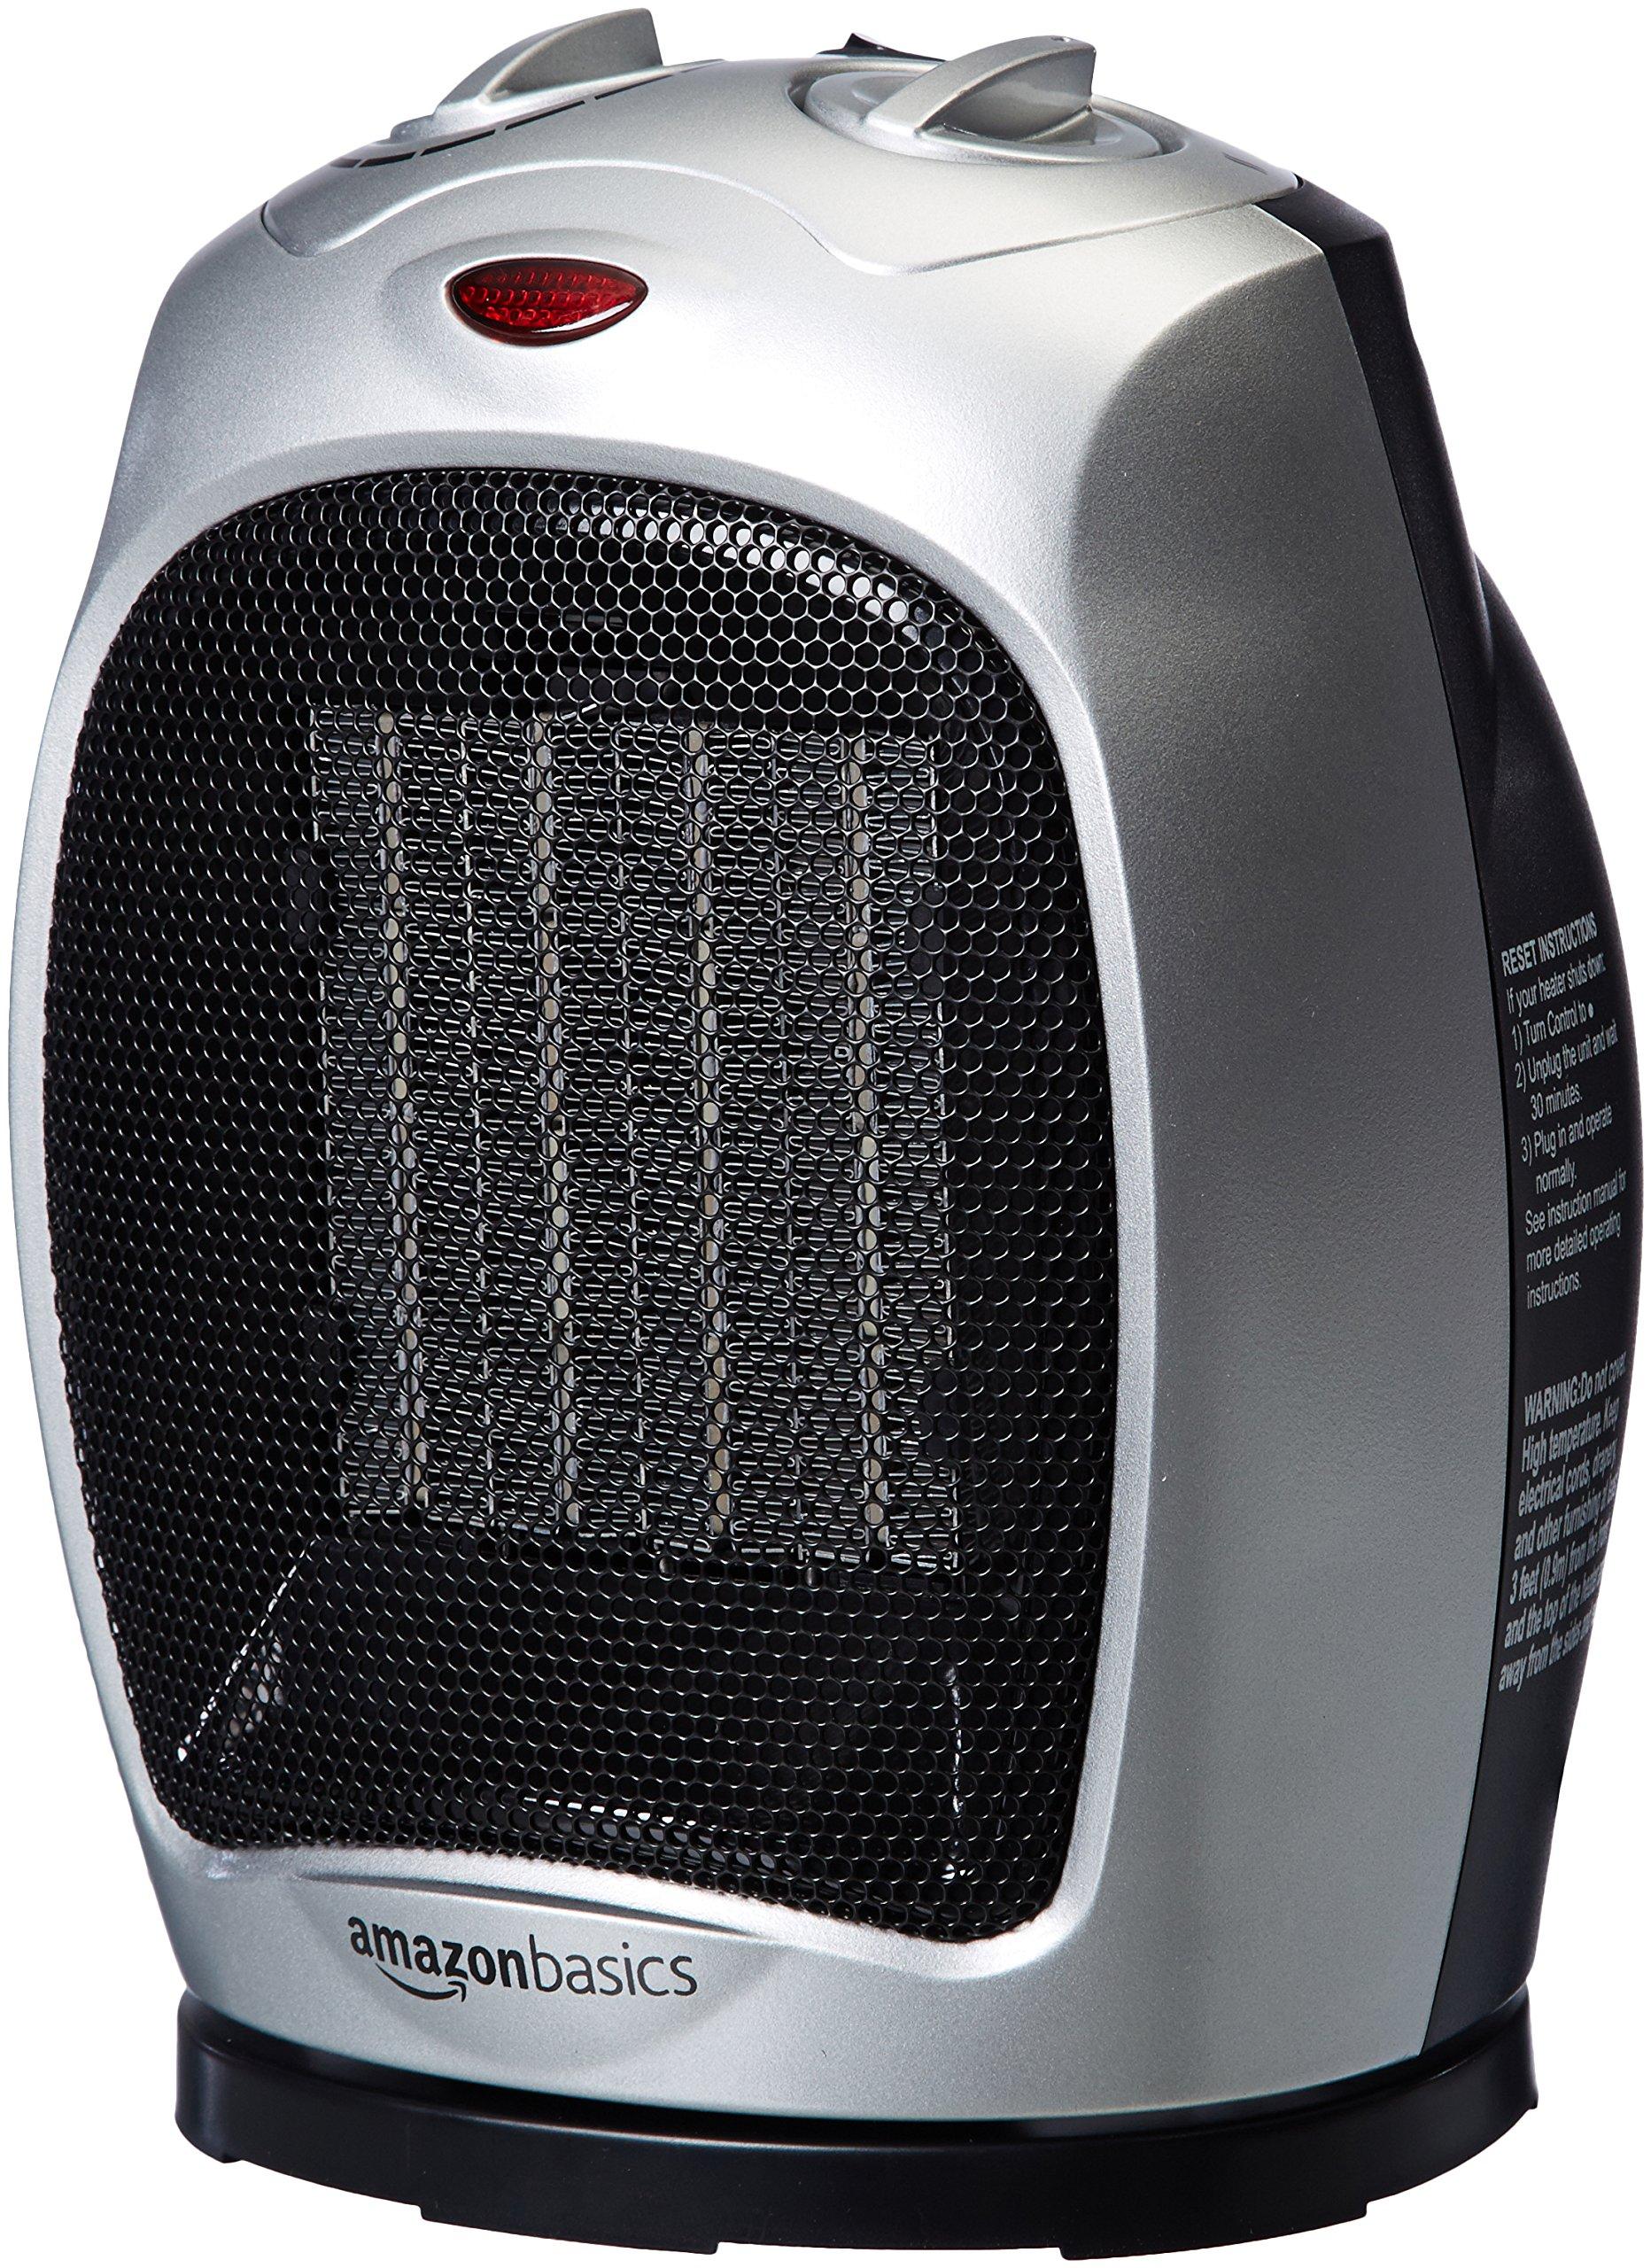 AmazonBasics 1500 Watt Oscillating Ceramic Space Heater with Adjustable Thermostat - Silver